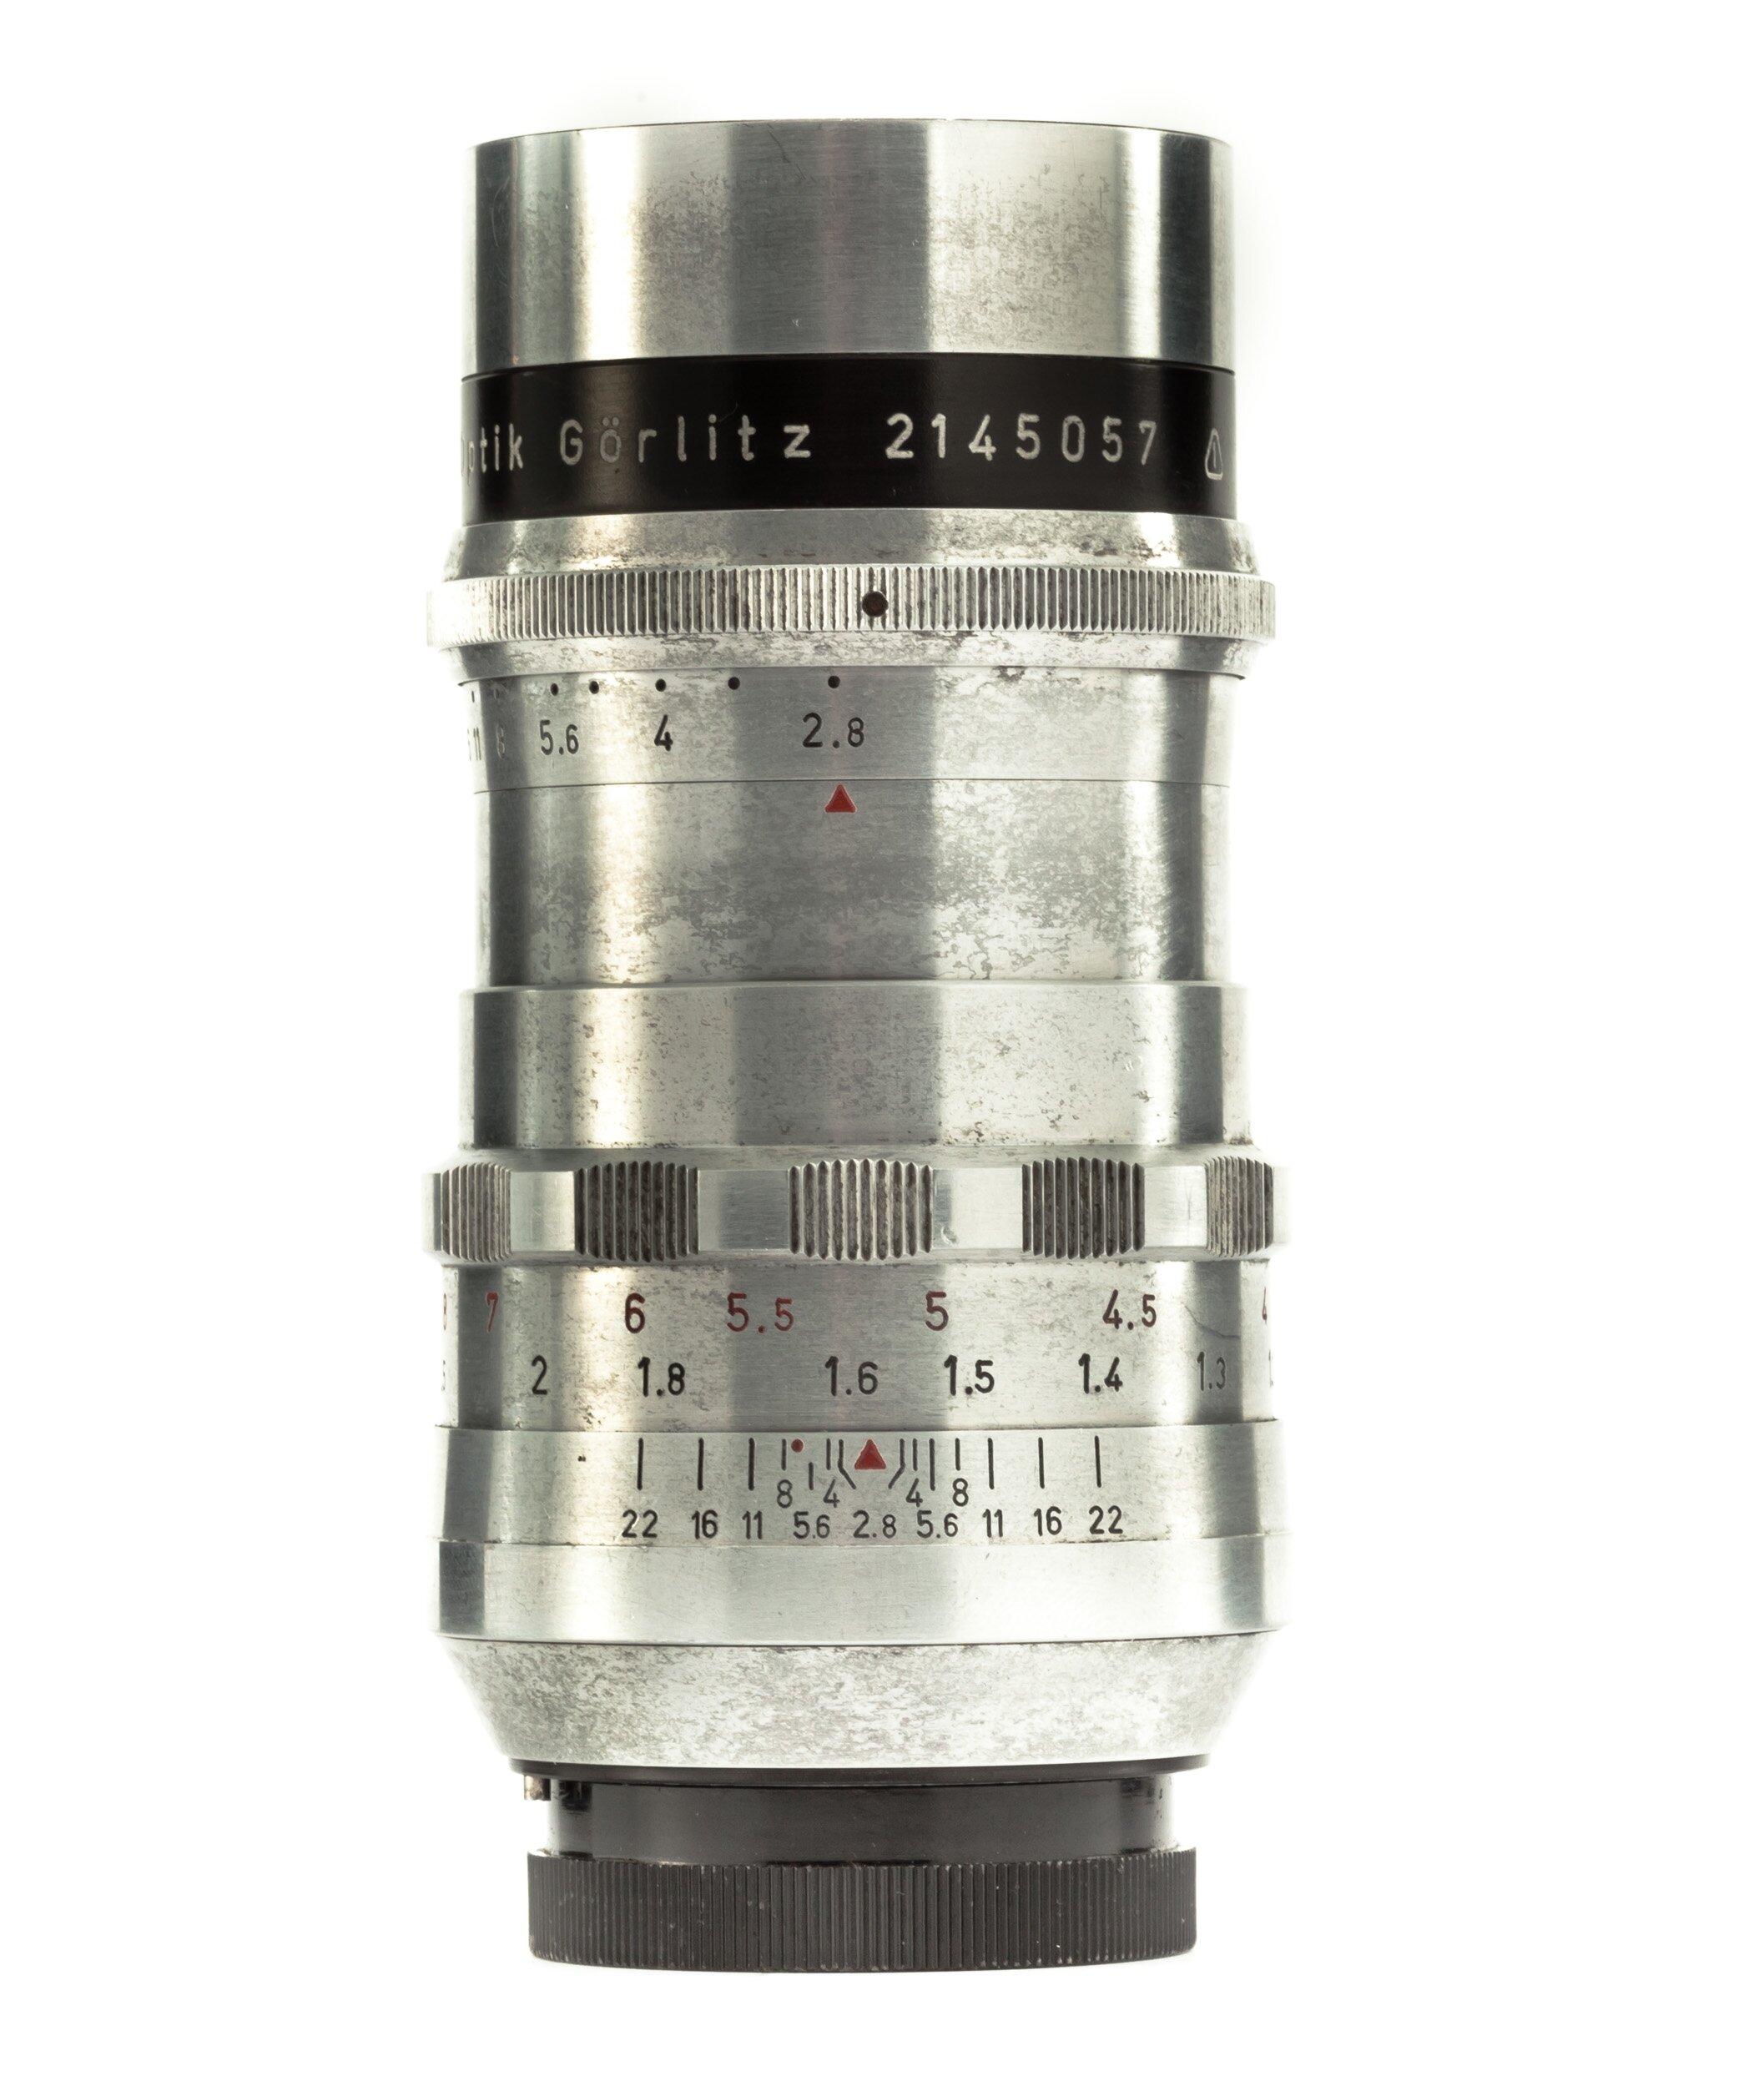 Meyer-Optik Görlitz f. Exakta 2,8/100mm Trioplan